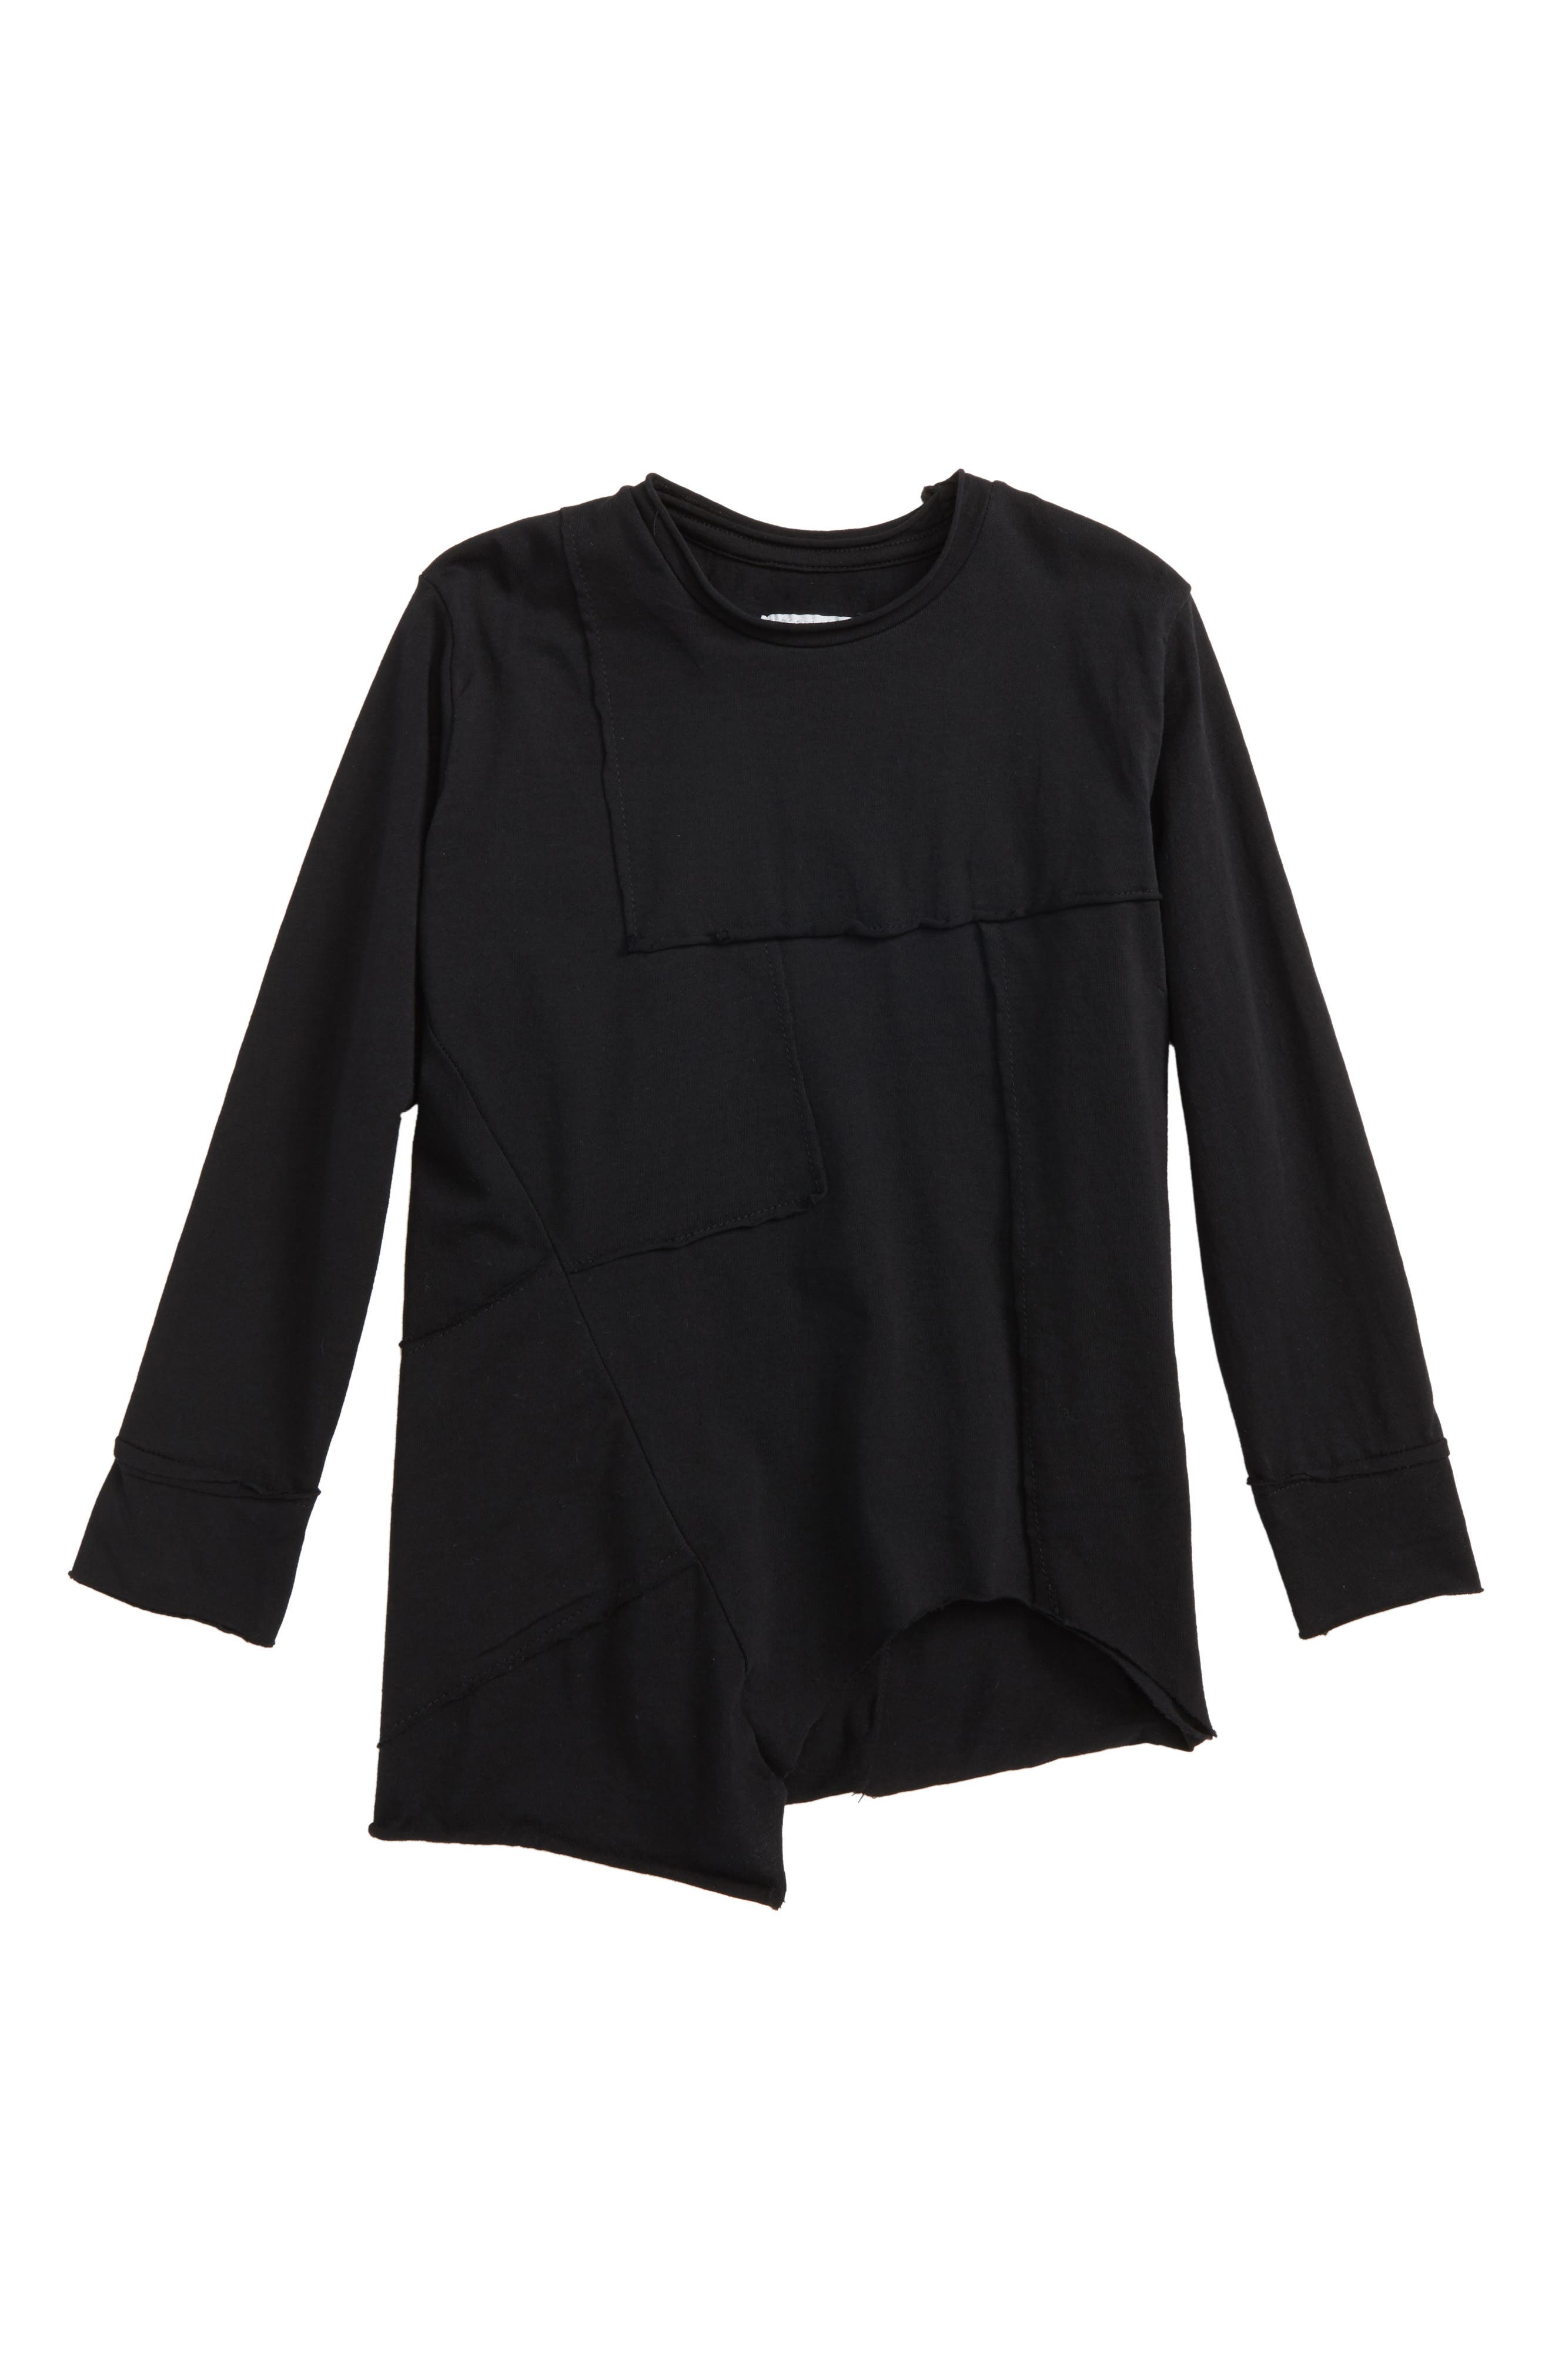 Patchwork Shirt,                             Main thumbnail 1, color,                             Black